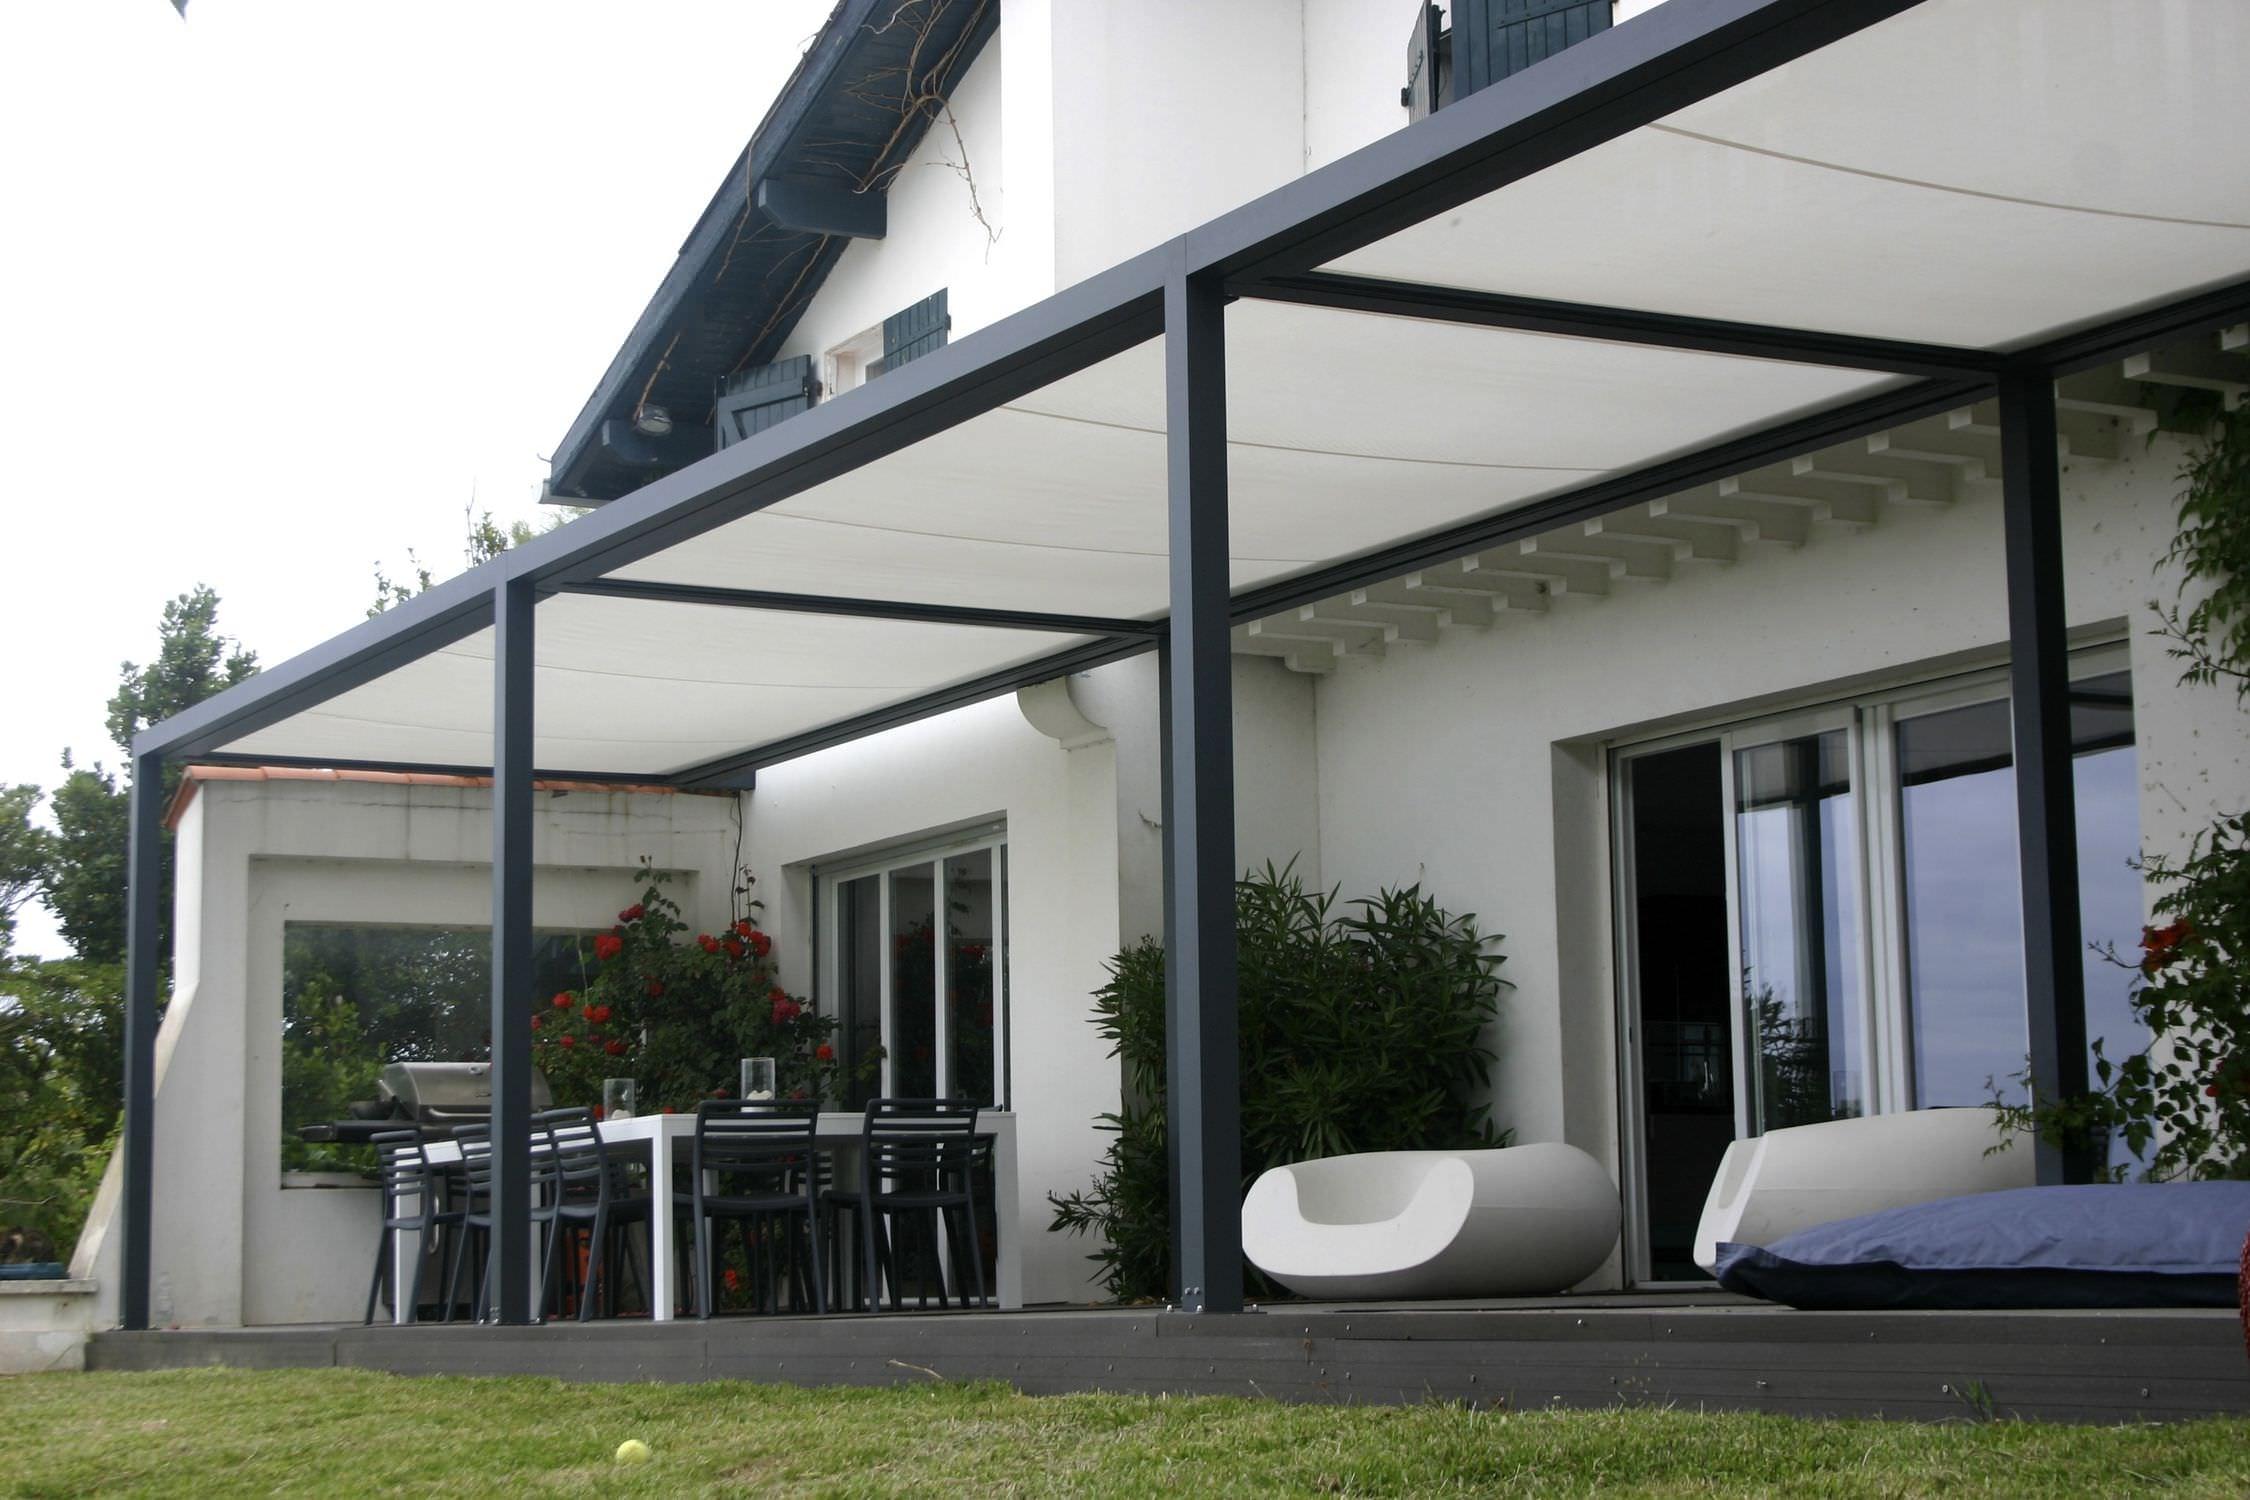 Backyard Patio Covers: From Usefulness To Style - HomesFeed on Backyard Patio Cover  id=83921